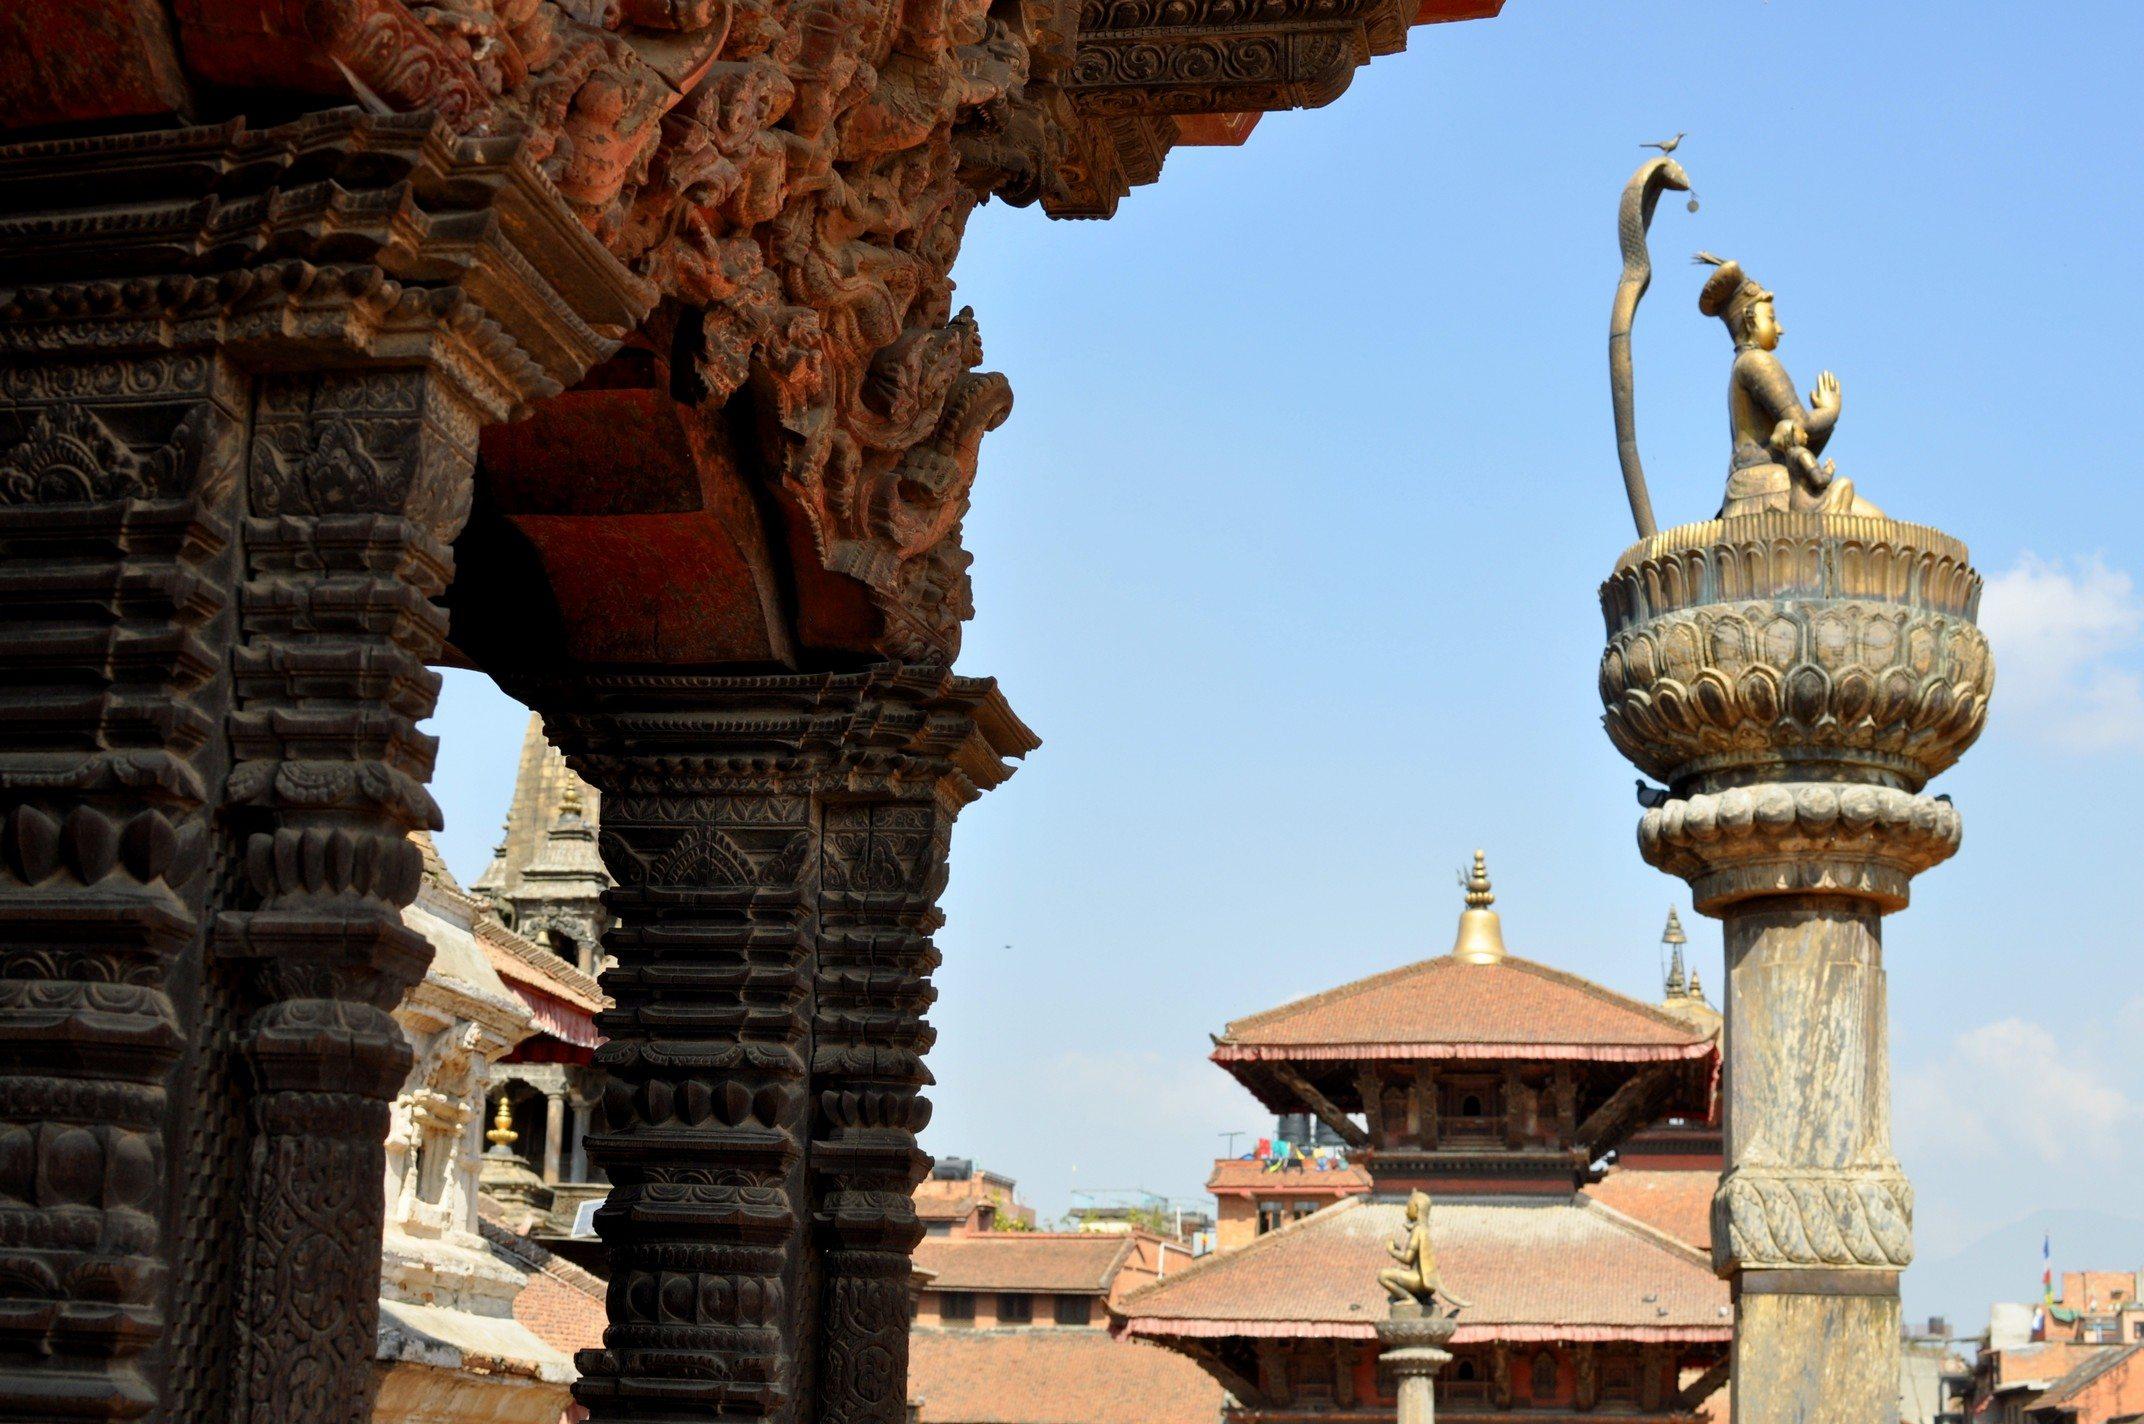 Vallée de Katmandou - Patan, Durbar Square. Statue du roi Yoganarendra Malla